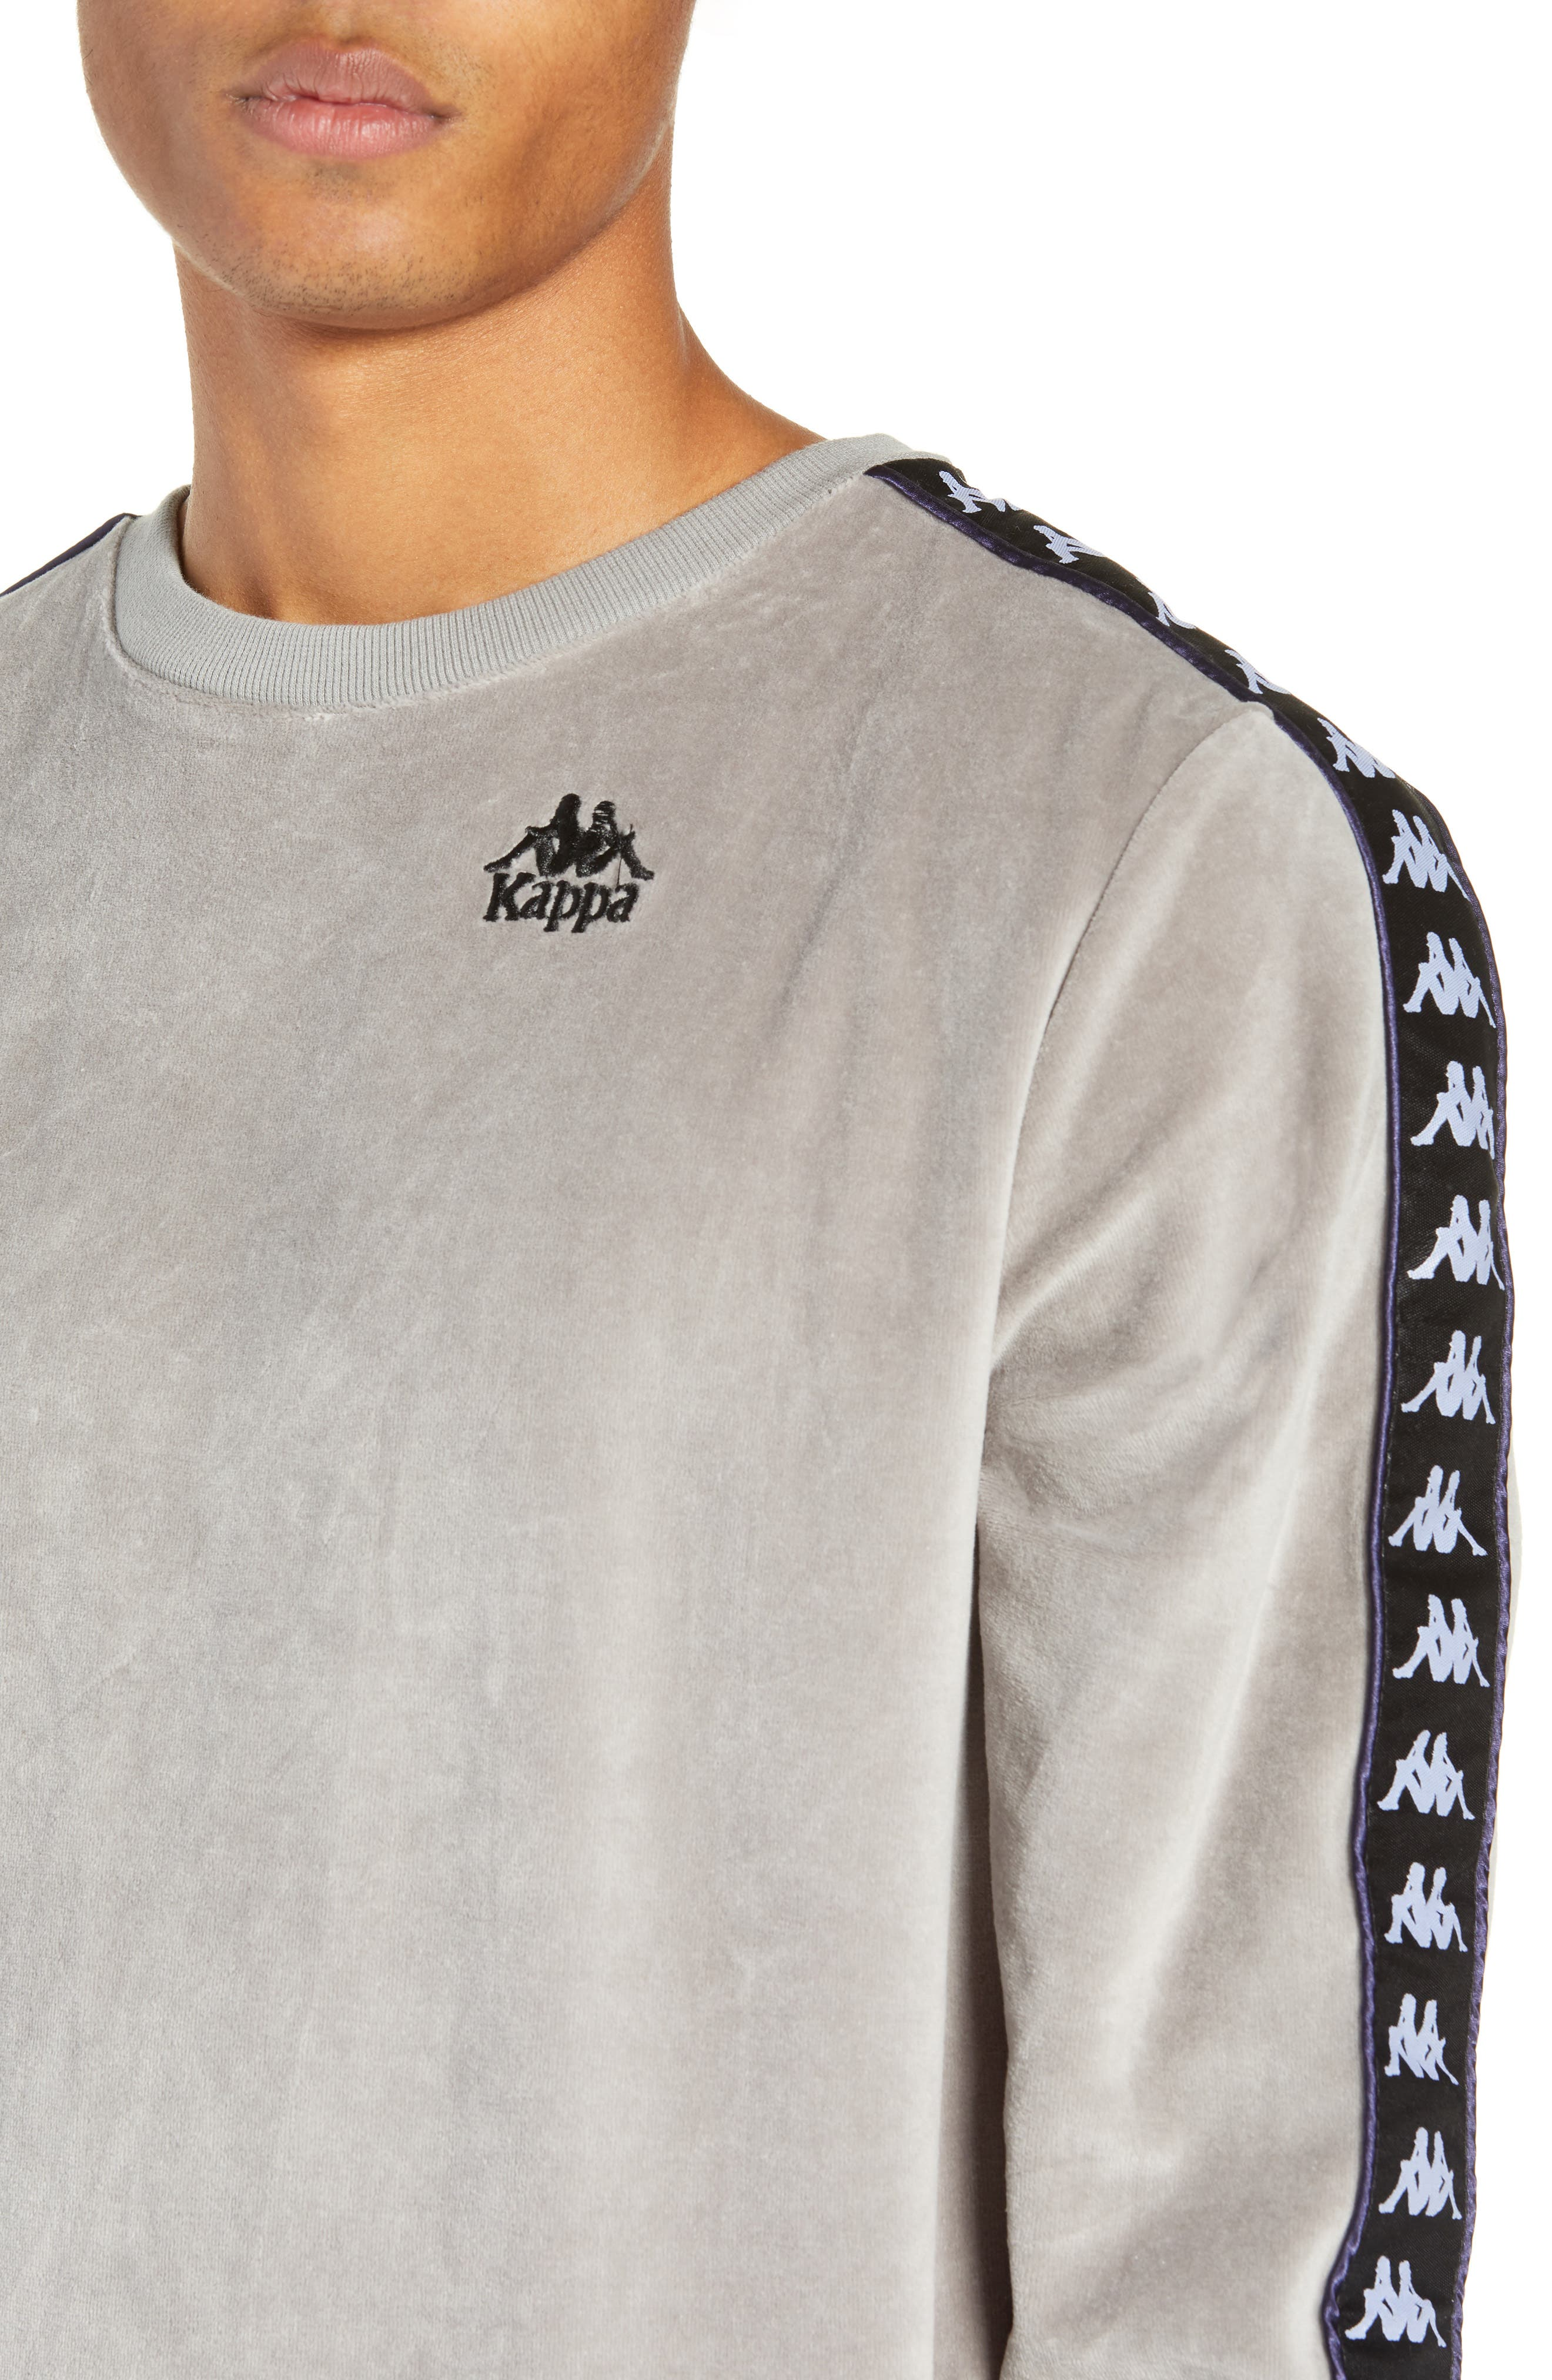 Authentic Aynset Velour Crewneck Sweatshirt,                             Alternate thumbnail 4, color,                             GREY MIST/ BLACK/ WHITE